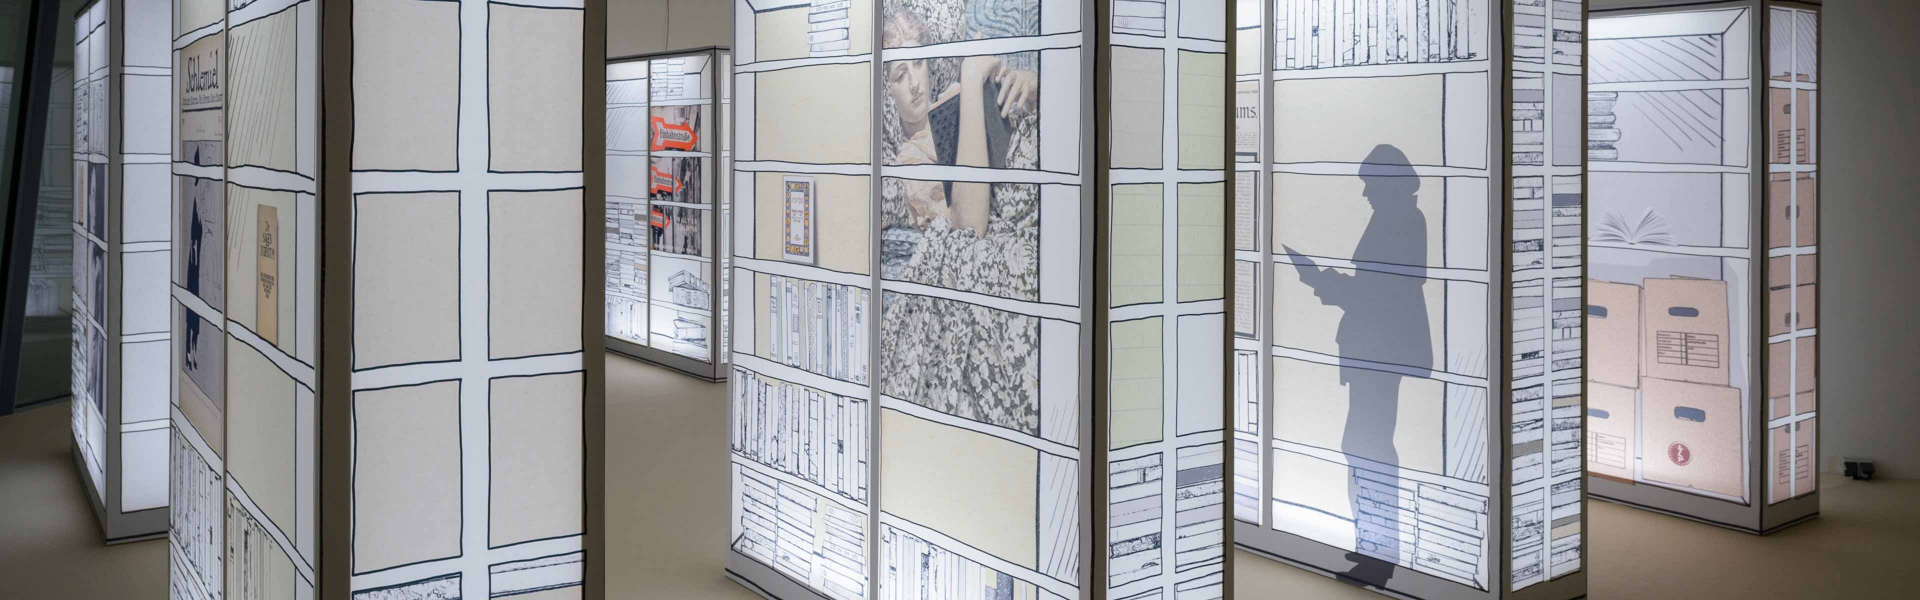 testamentarische spenden j disches museum berlin. Black Bedroom Furniture Sets. Home Design Ideas